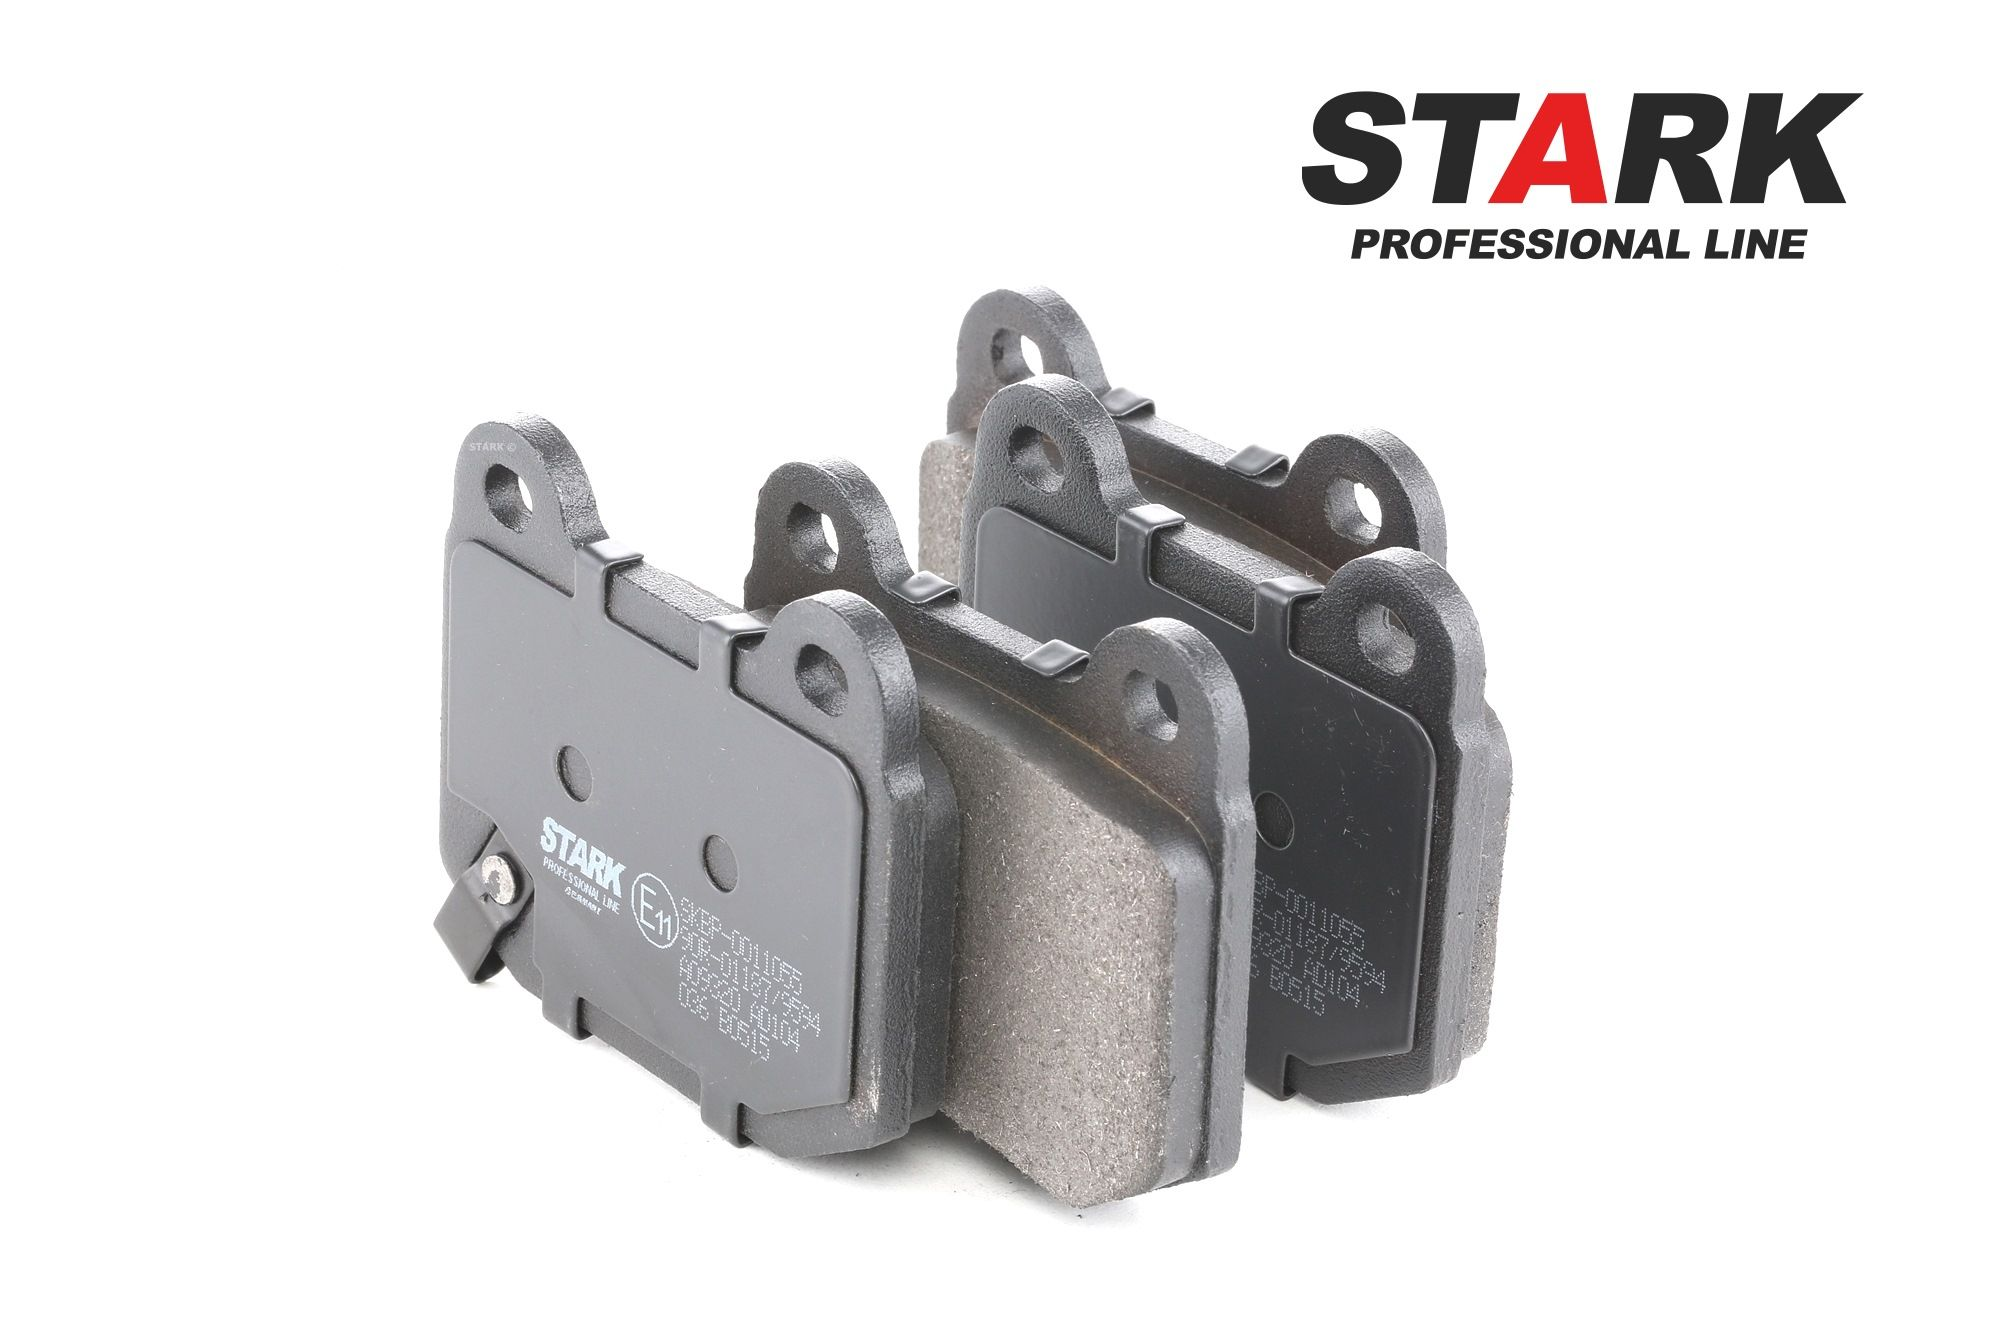 SUBARU WRX 2016 Bremsbeläge - Original STARK SKBP-0011055 Höhe: 65,5mm, Breite: 76,5mm, Dicke/Stärke: 14,3mm